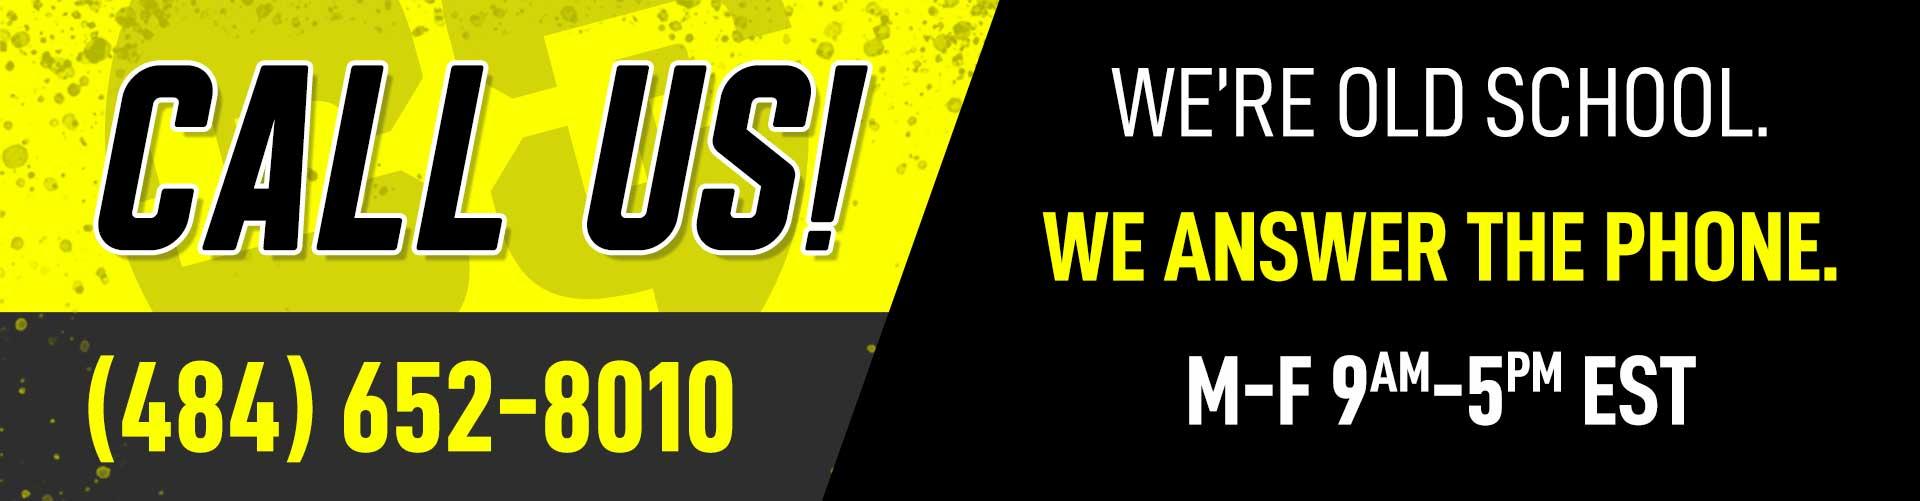 billetproofdesign.com-homepage-ad-call-us-with-phone-number-1.jpg